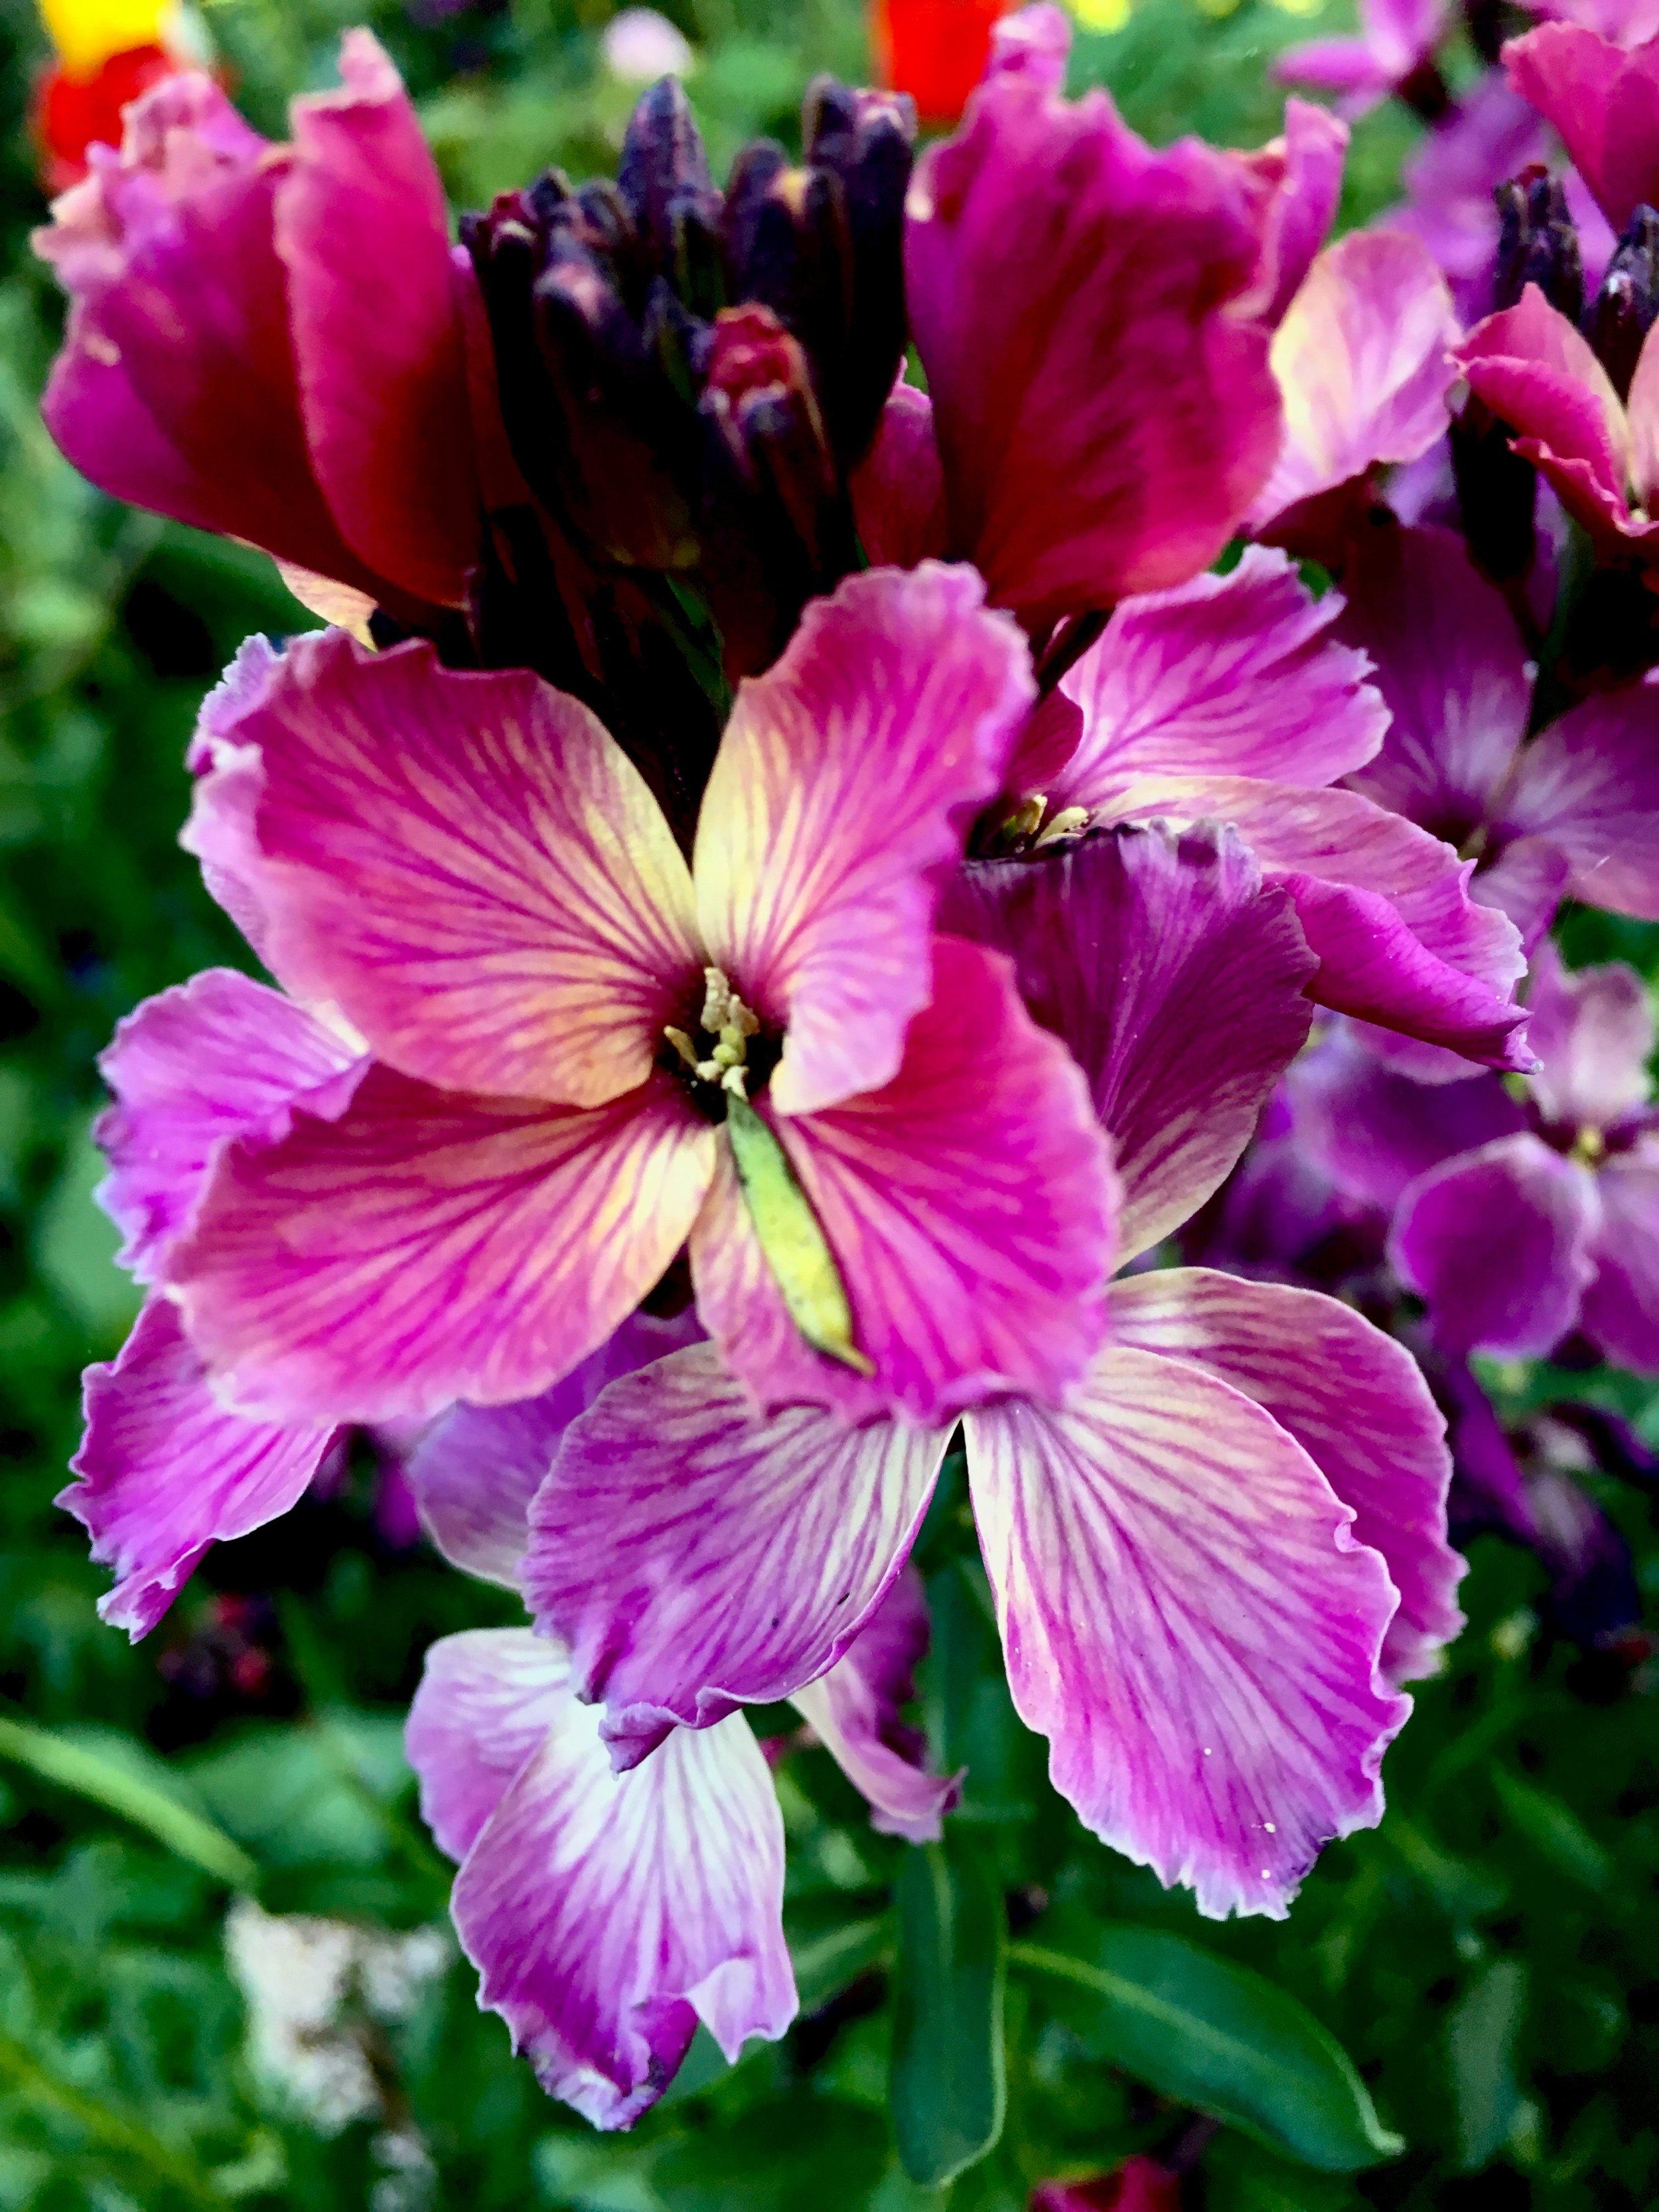 Gyldenlak eller Erysimum 'Sunset Purple' dufter dejligt og har det fineste farvespil mellem lilla, lys gul og lyserød.